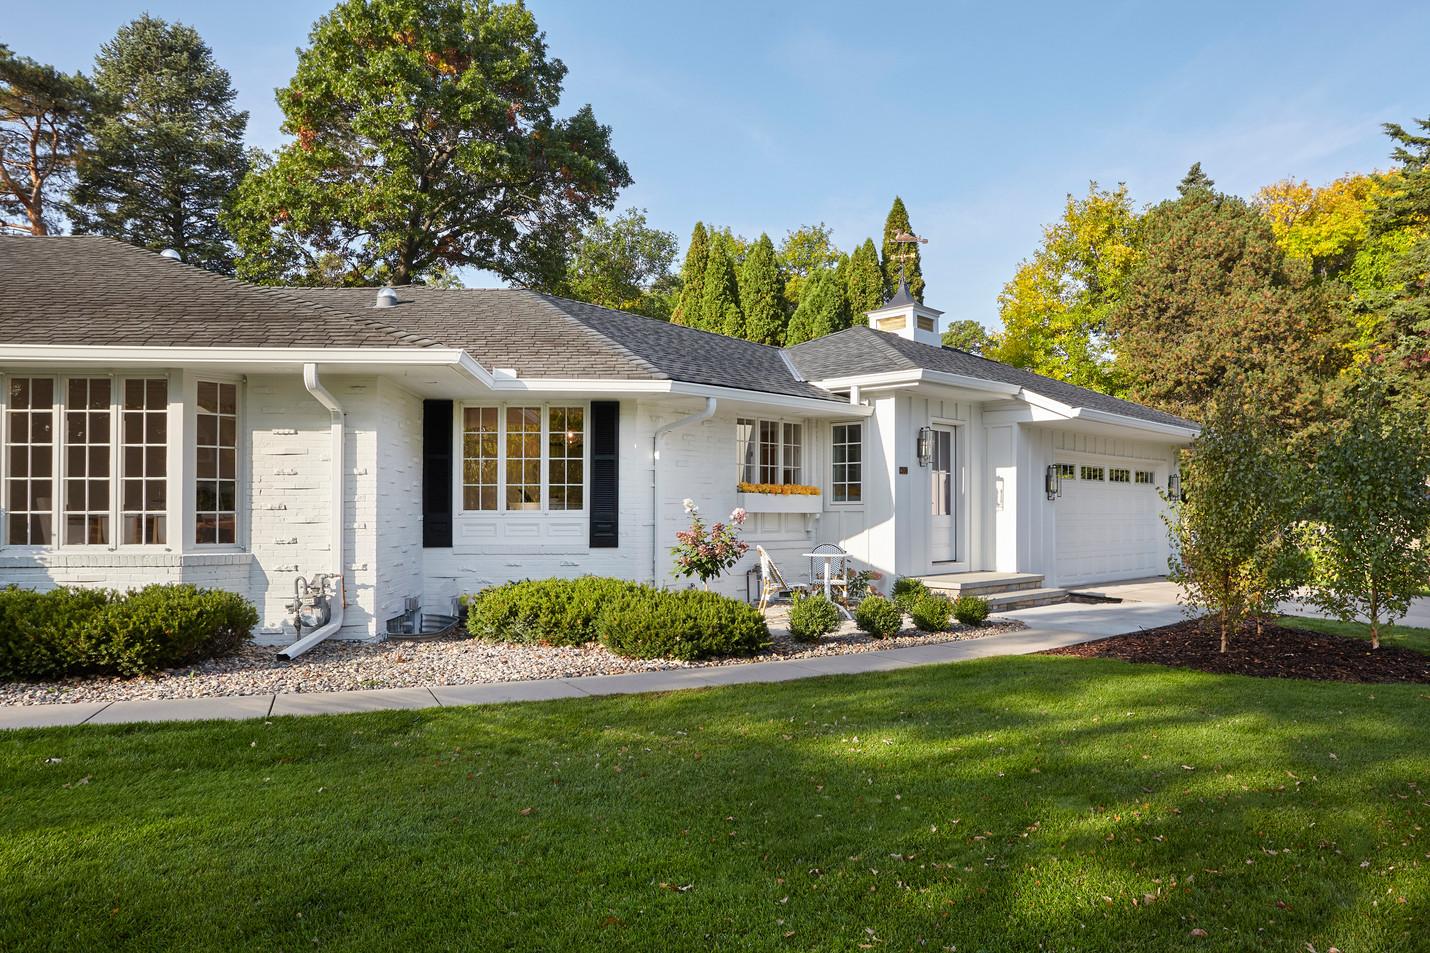 4001 Basswood_half house patio side.jpg